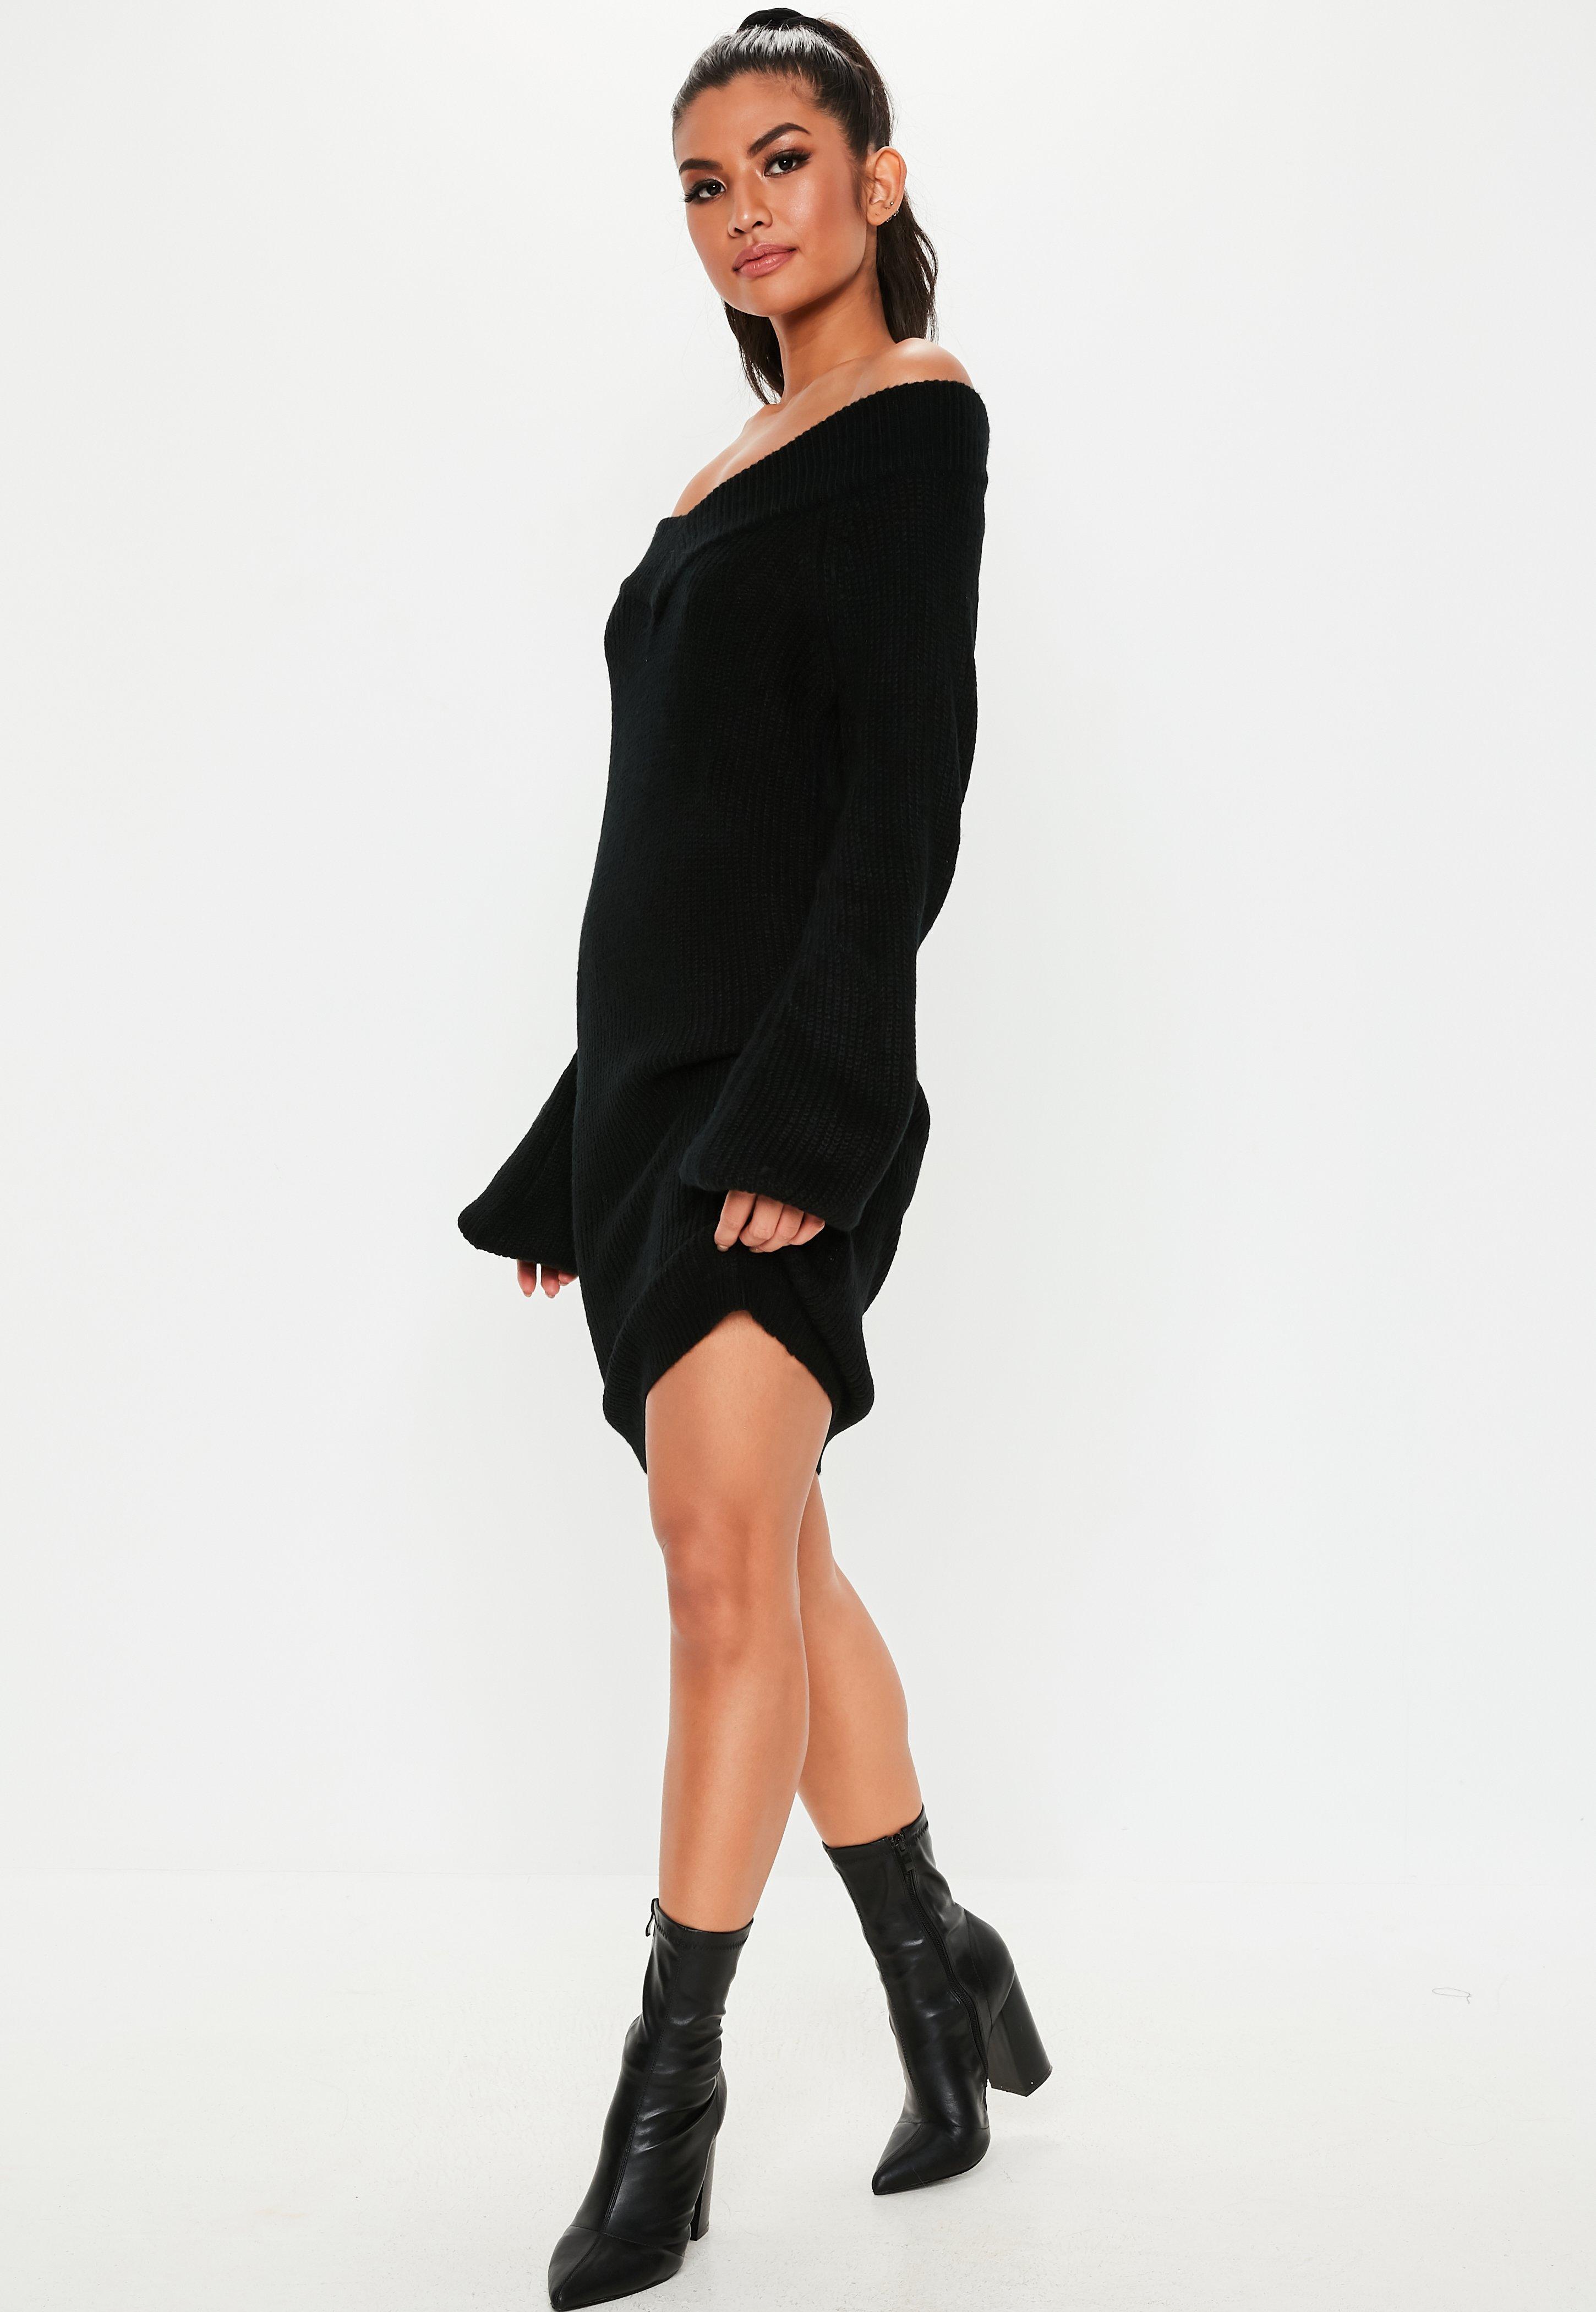 d6230ebb735 Petite Black V Neck Jumper Dress